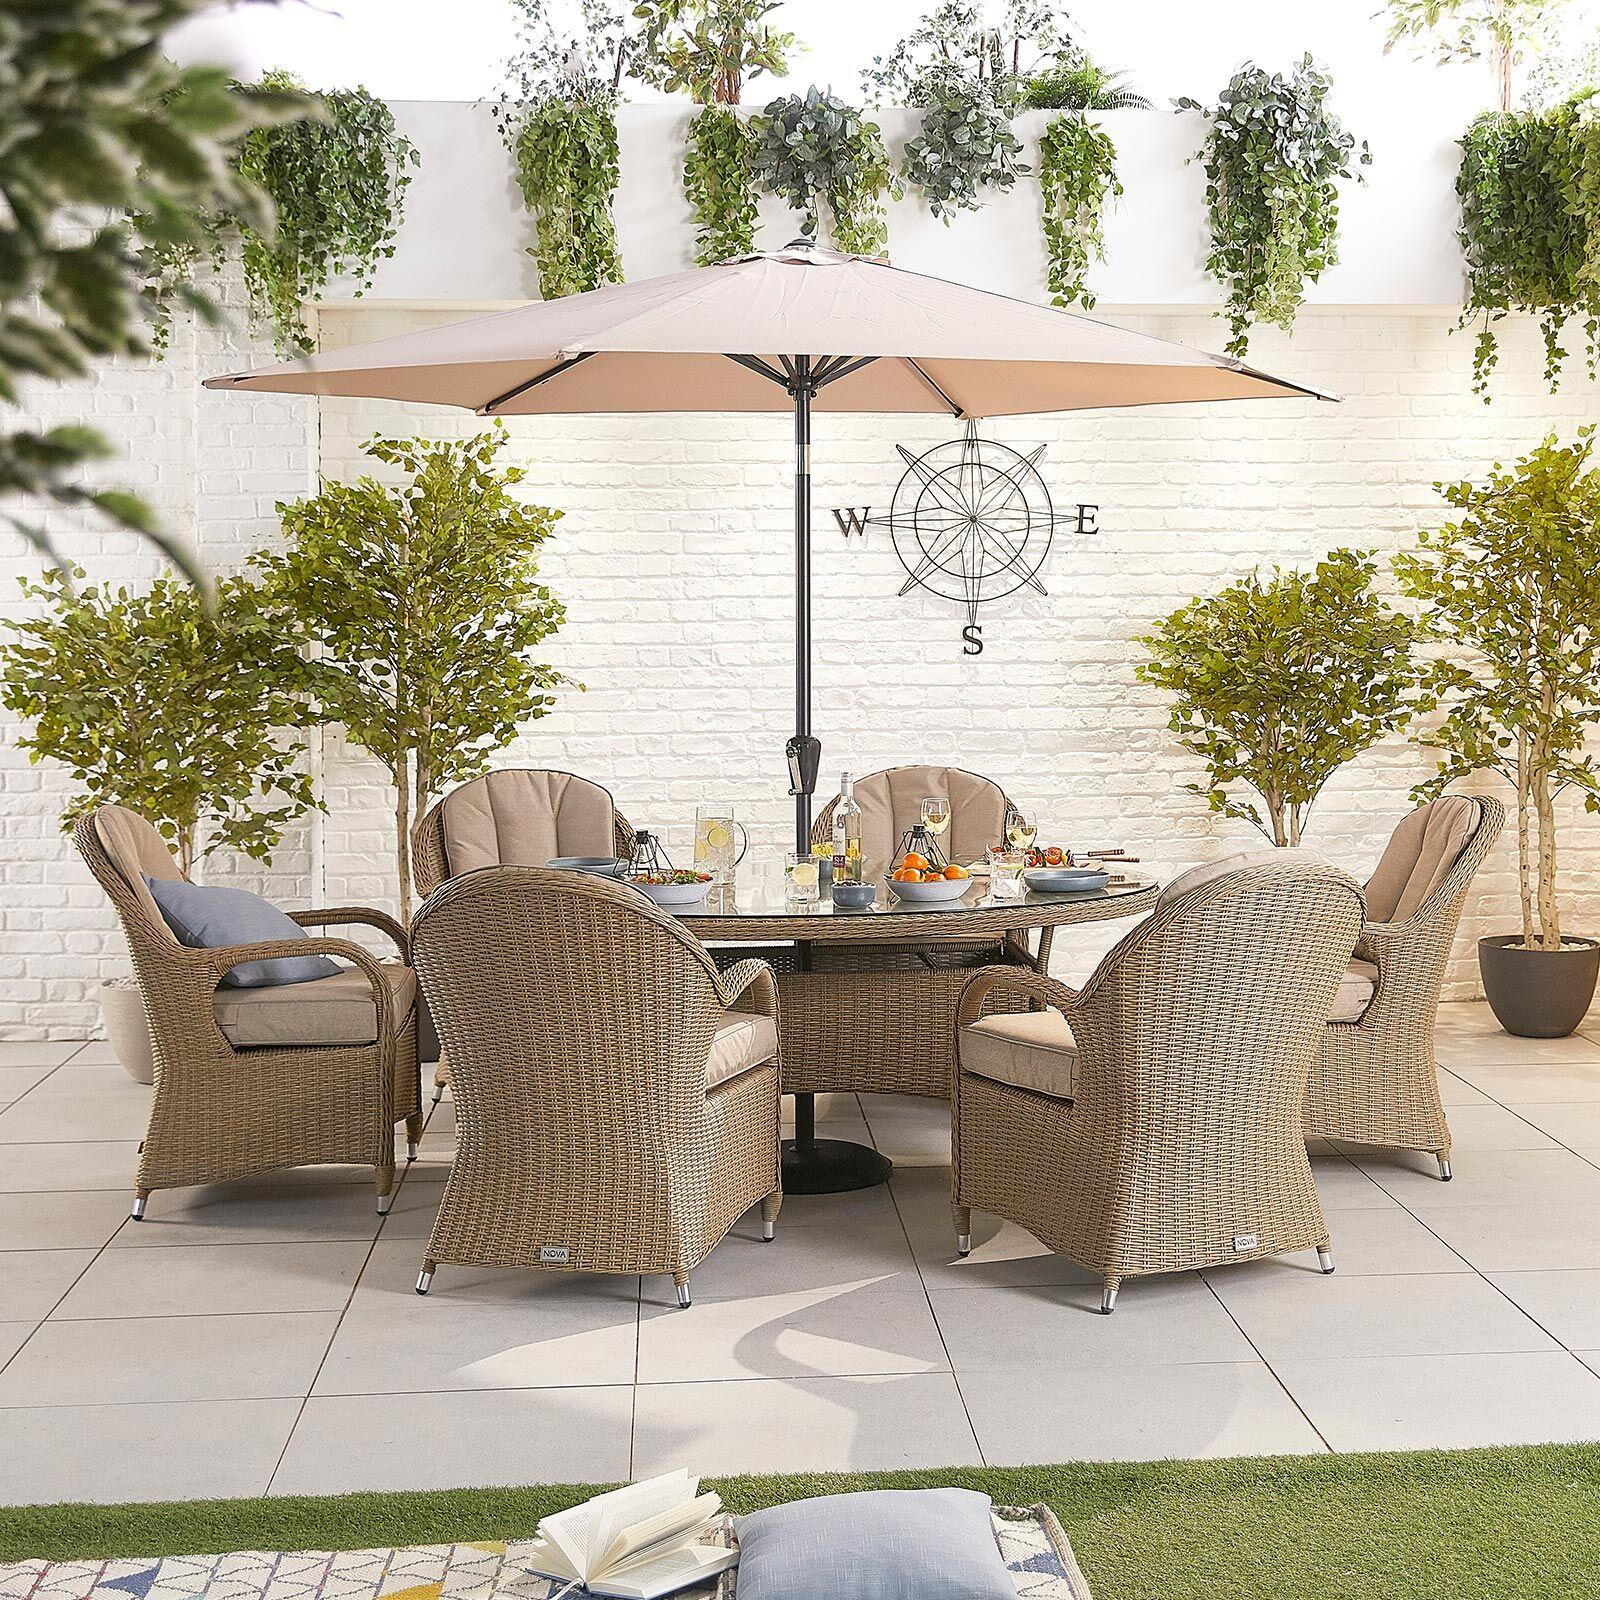 Oakworld Alfresco Heritage Leeanna 6 Seat Dining Set   1.8m x 1.2m Oval Table   Willow